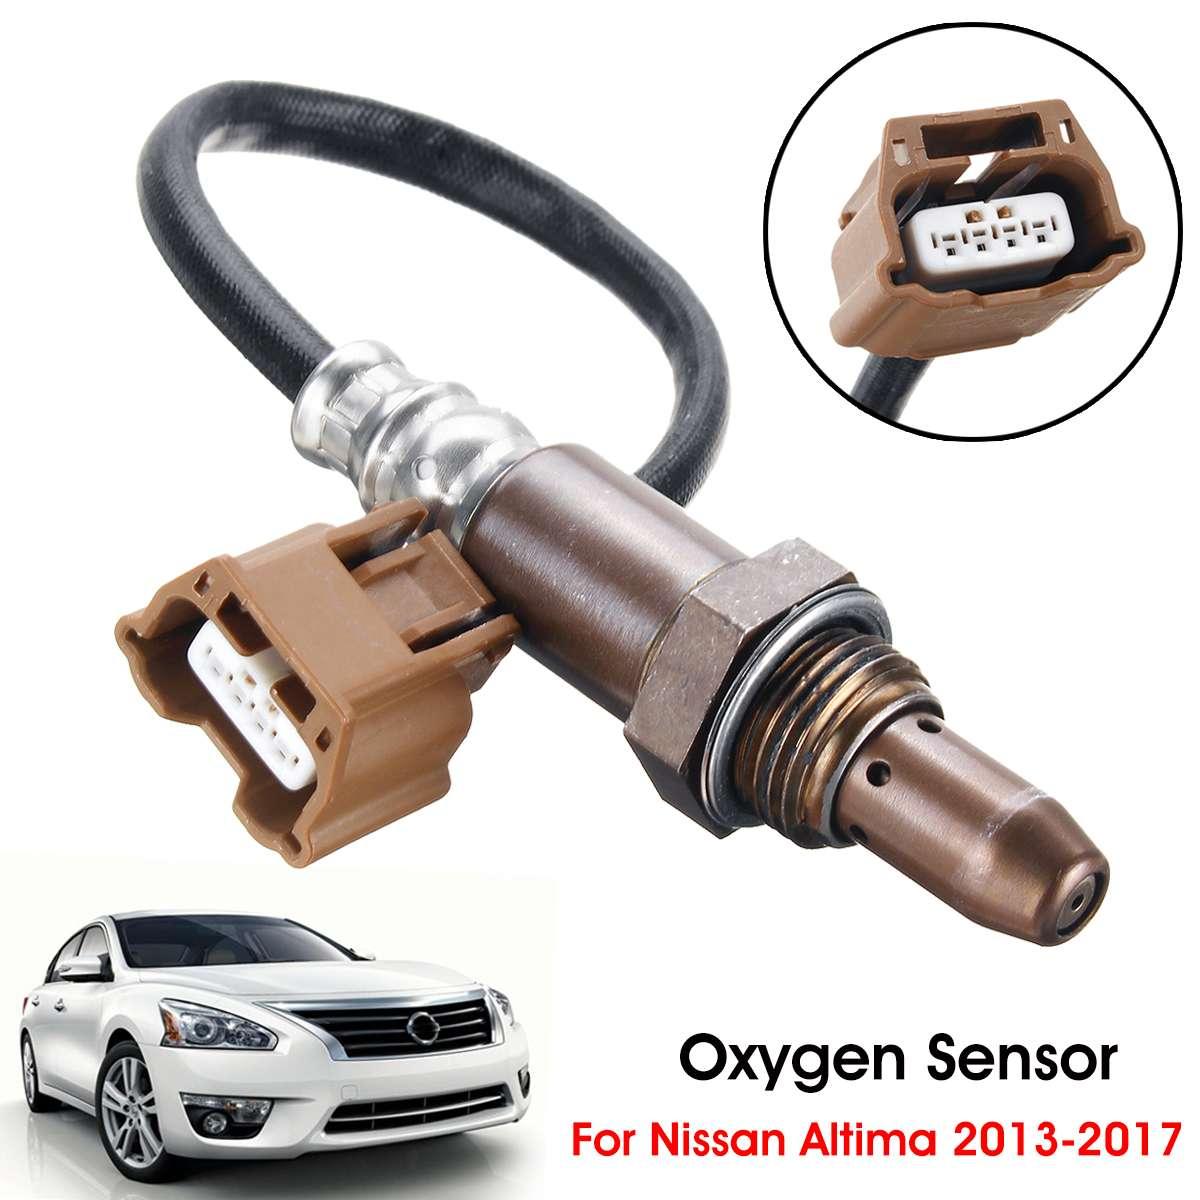 Upstream Car Air Fuel Ratio O2 Oxygen Sensor for Nissan Altima 2 5L 2013 2014 2015